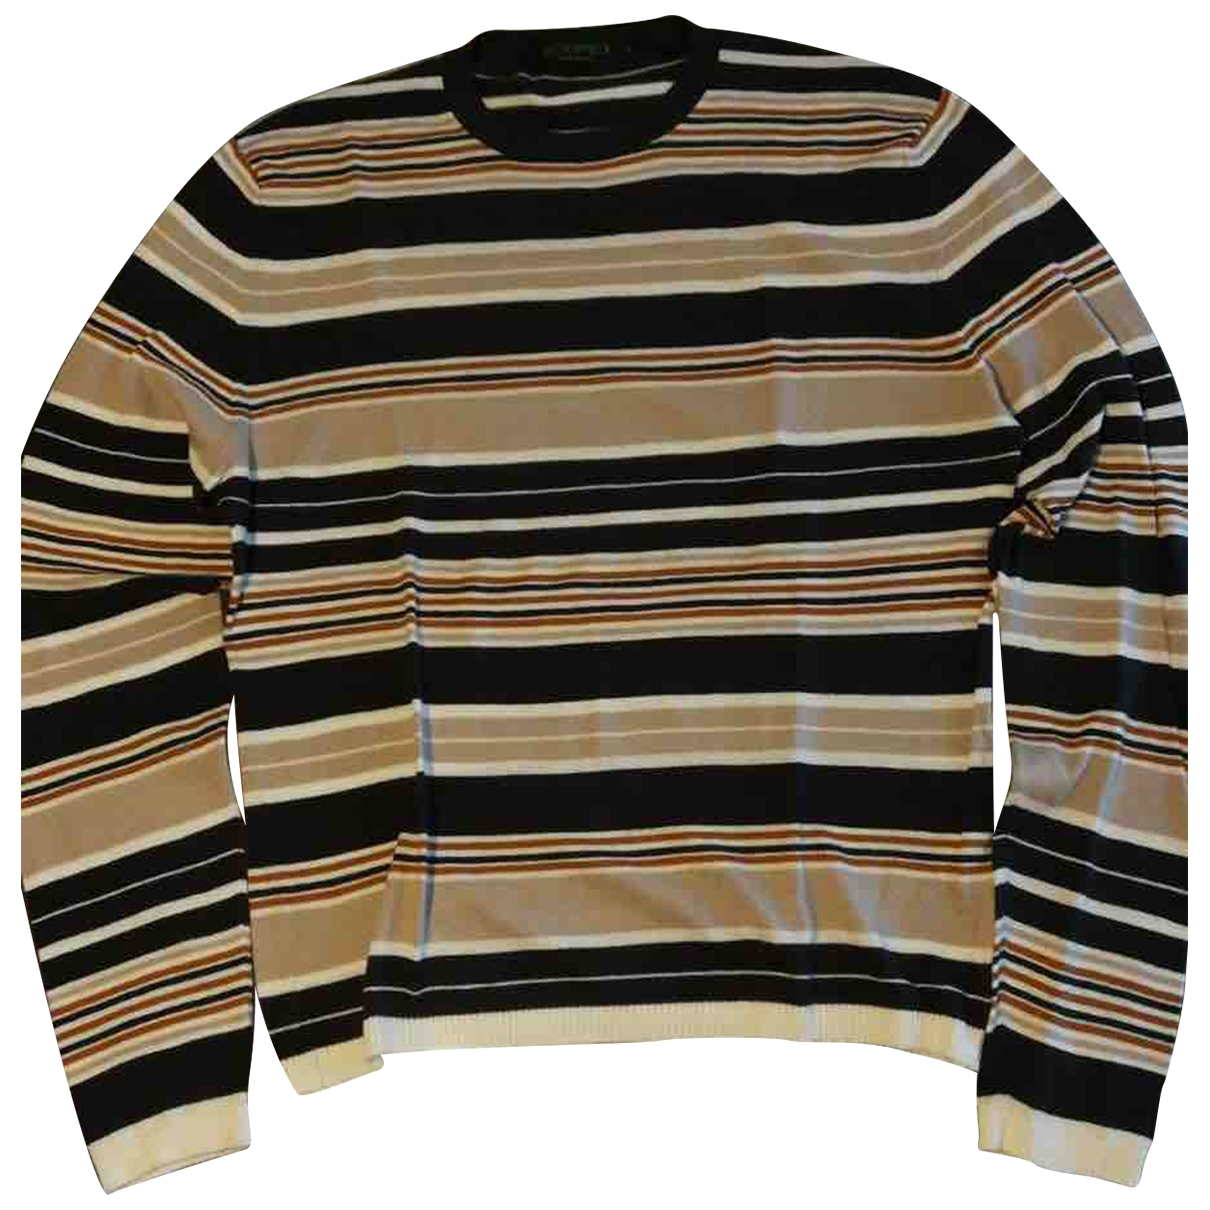 Etro \N Brown Cotton Knitwear & Sweatshirts for Men S International